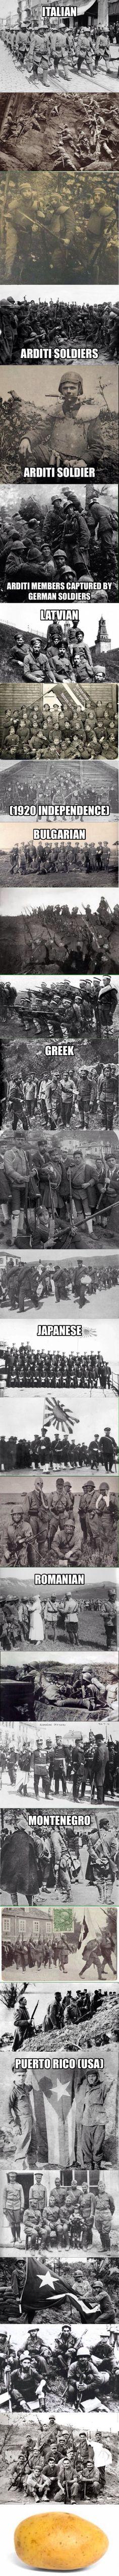 Armies of WW1 part 3